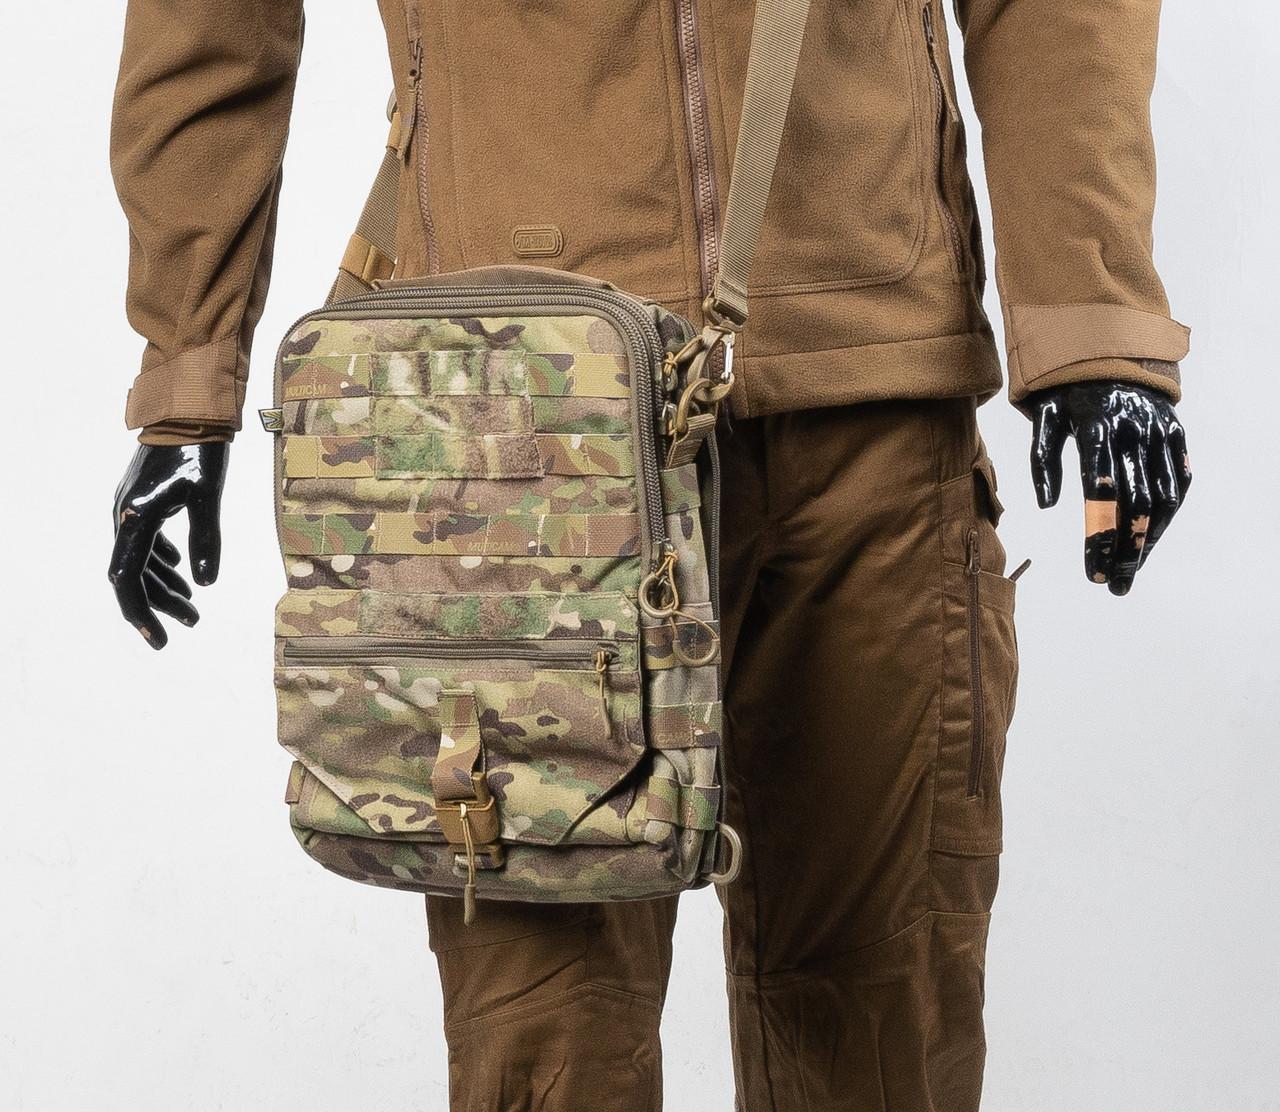 Тактичний планшет (тактична сумка планшет), колір мультикам